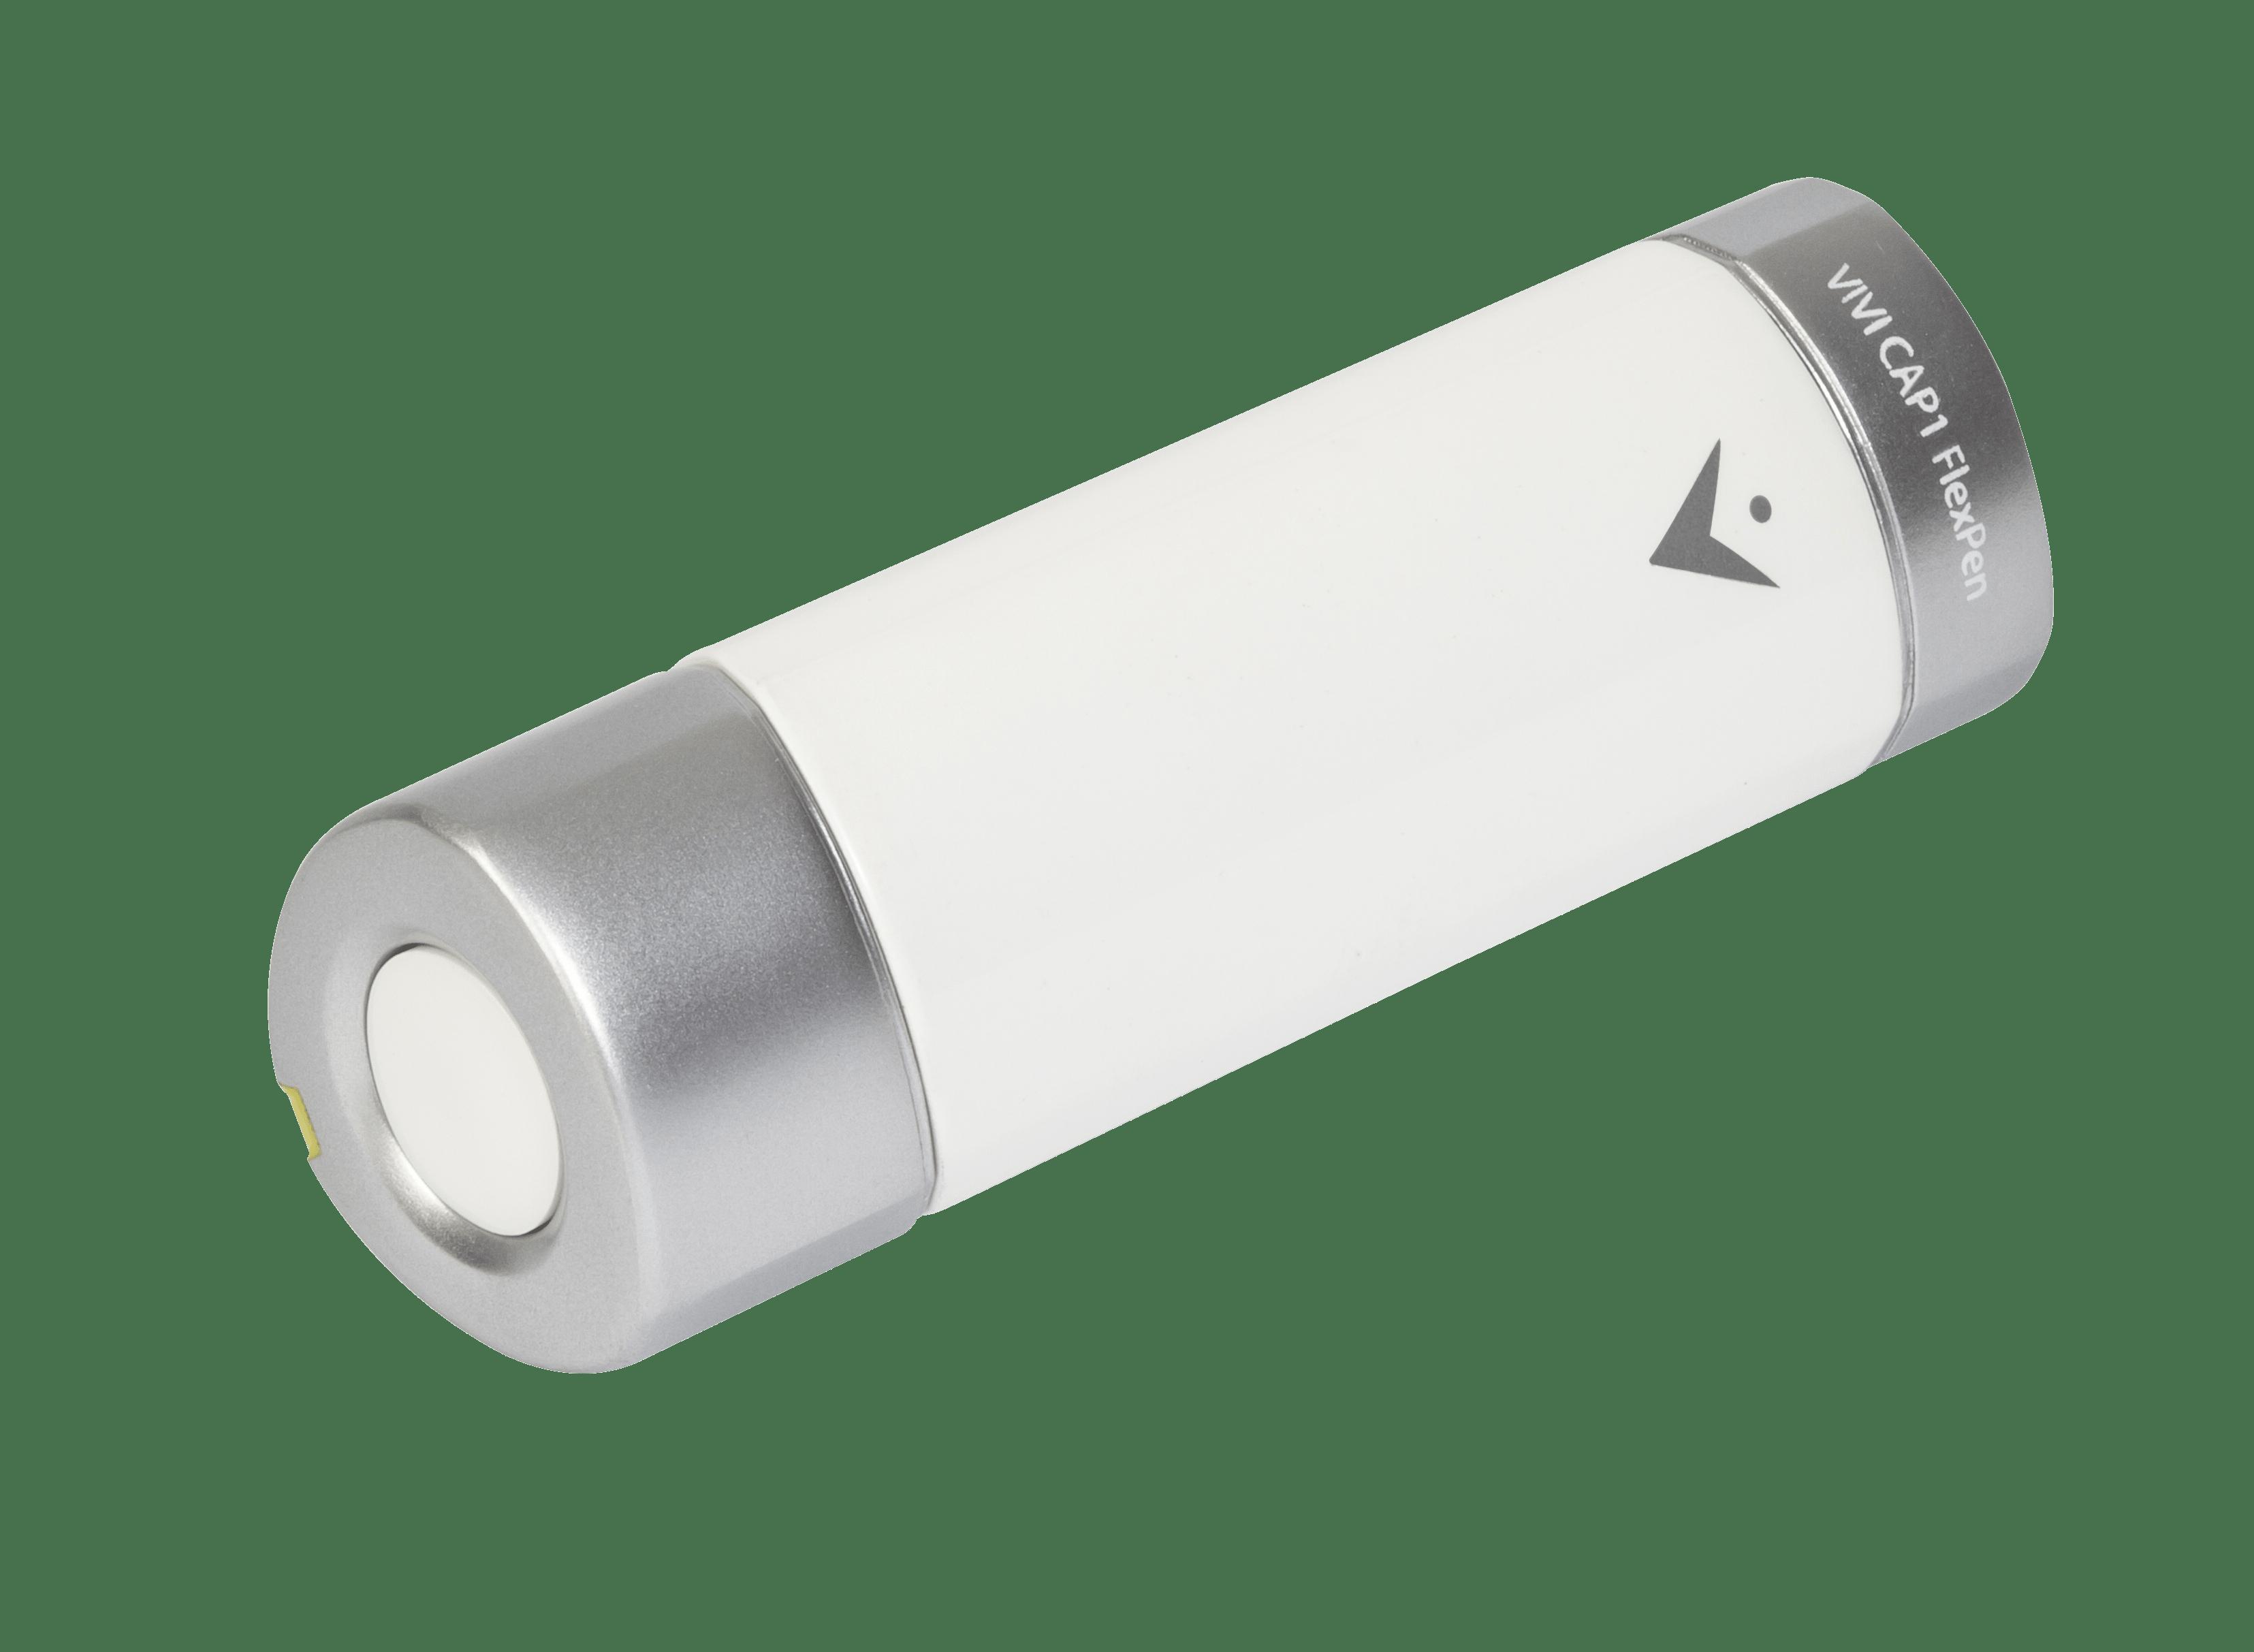 ViviCap 1 Temperaturschutzkappe für Insulinpens